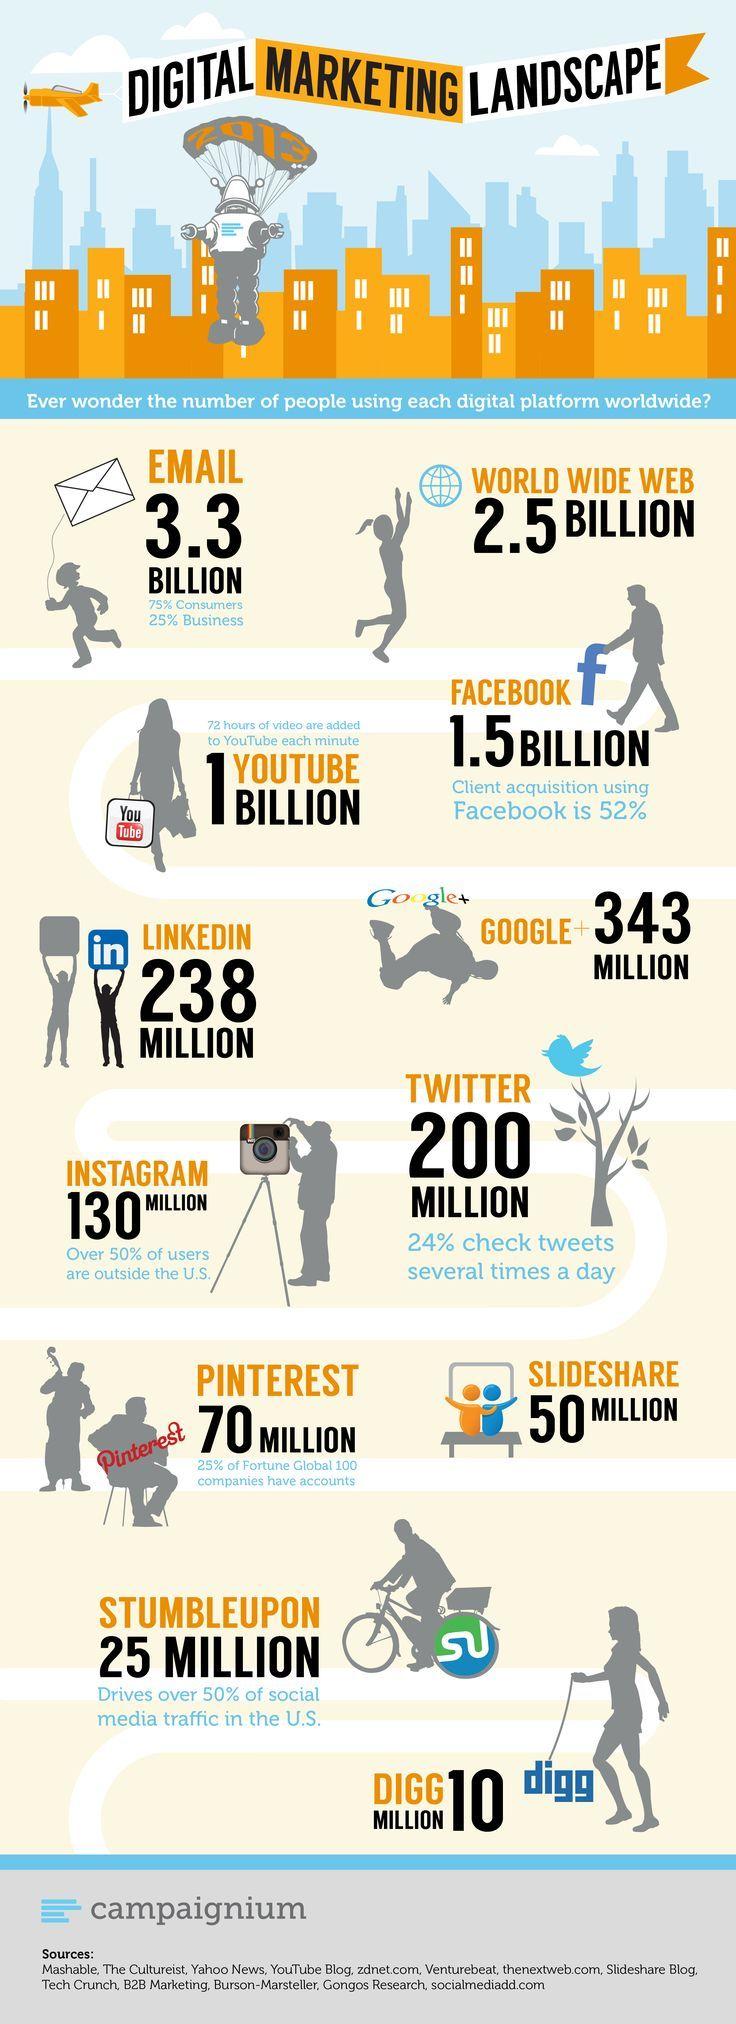 Le marketing digital en chiffres et en infographie | Agence web 1min30, Inbound marketing et communication digitale 360°